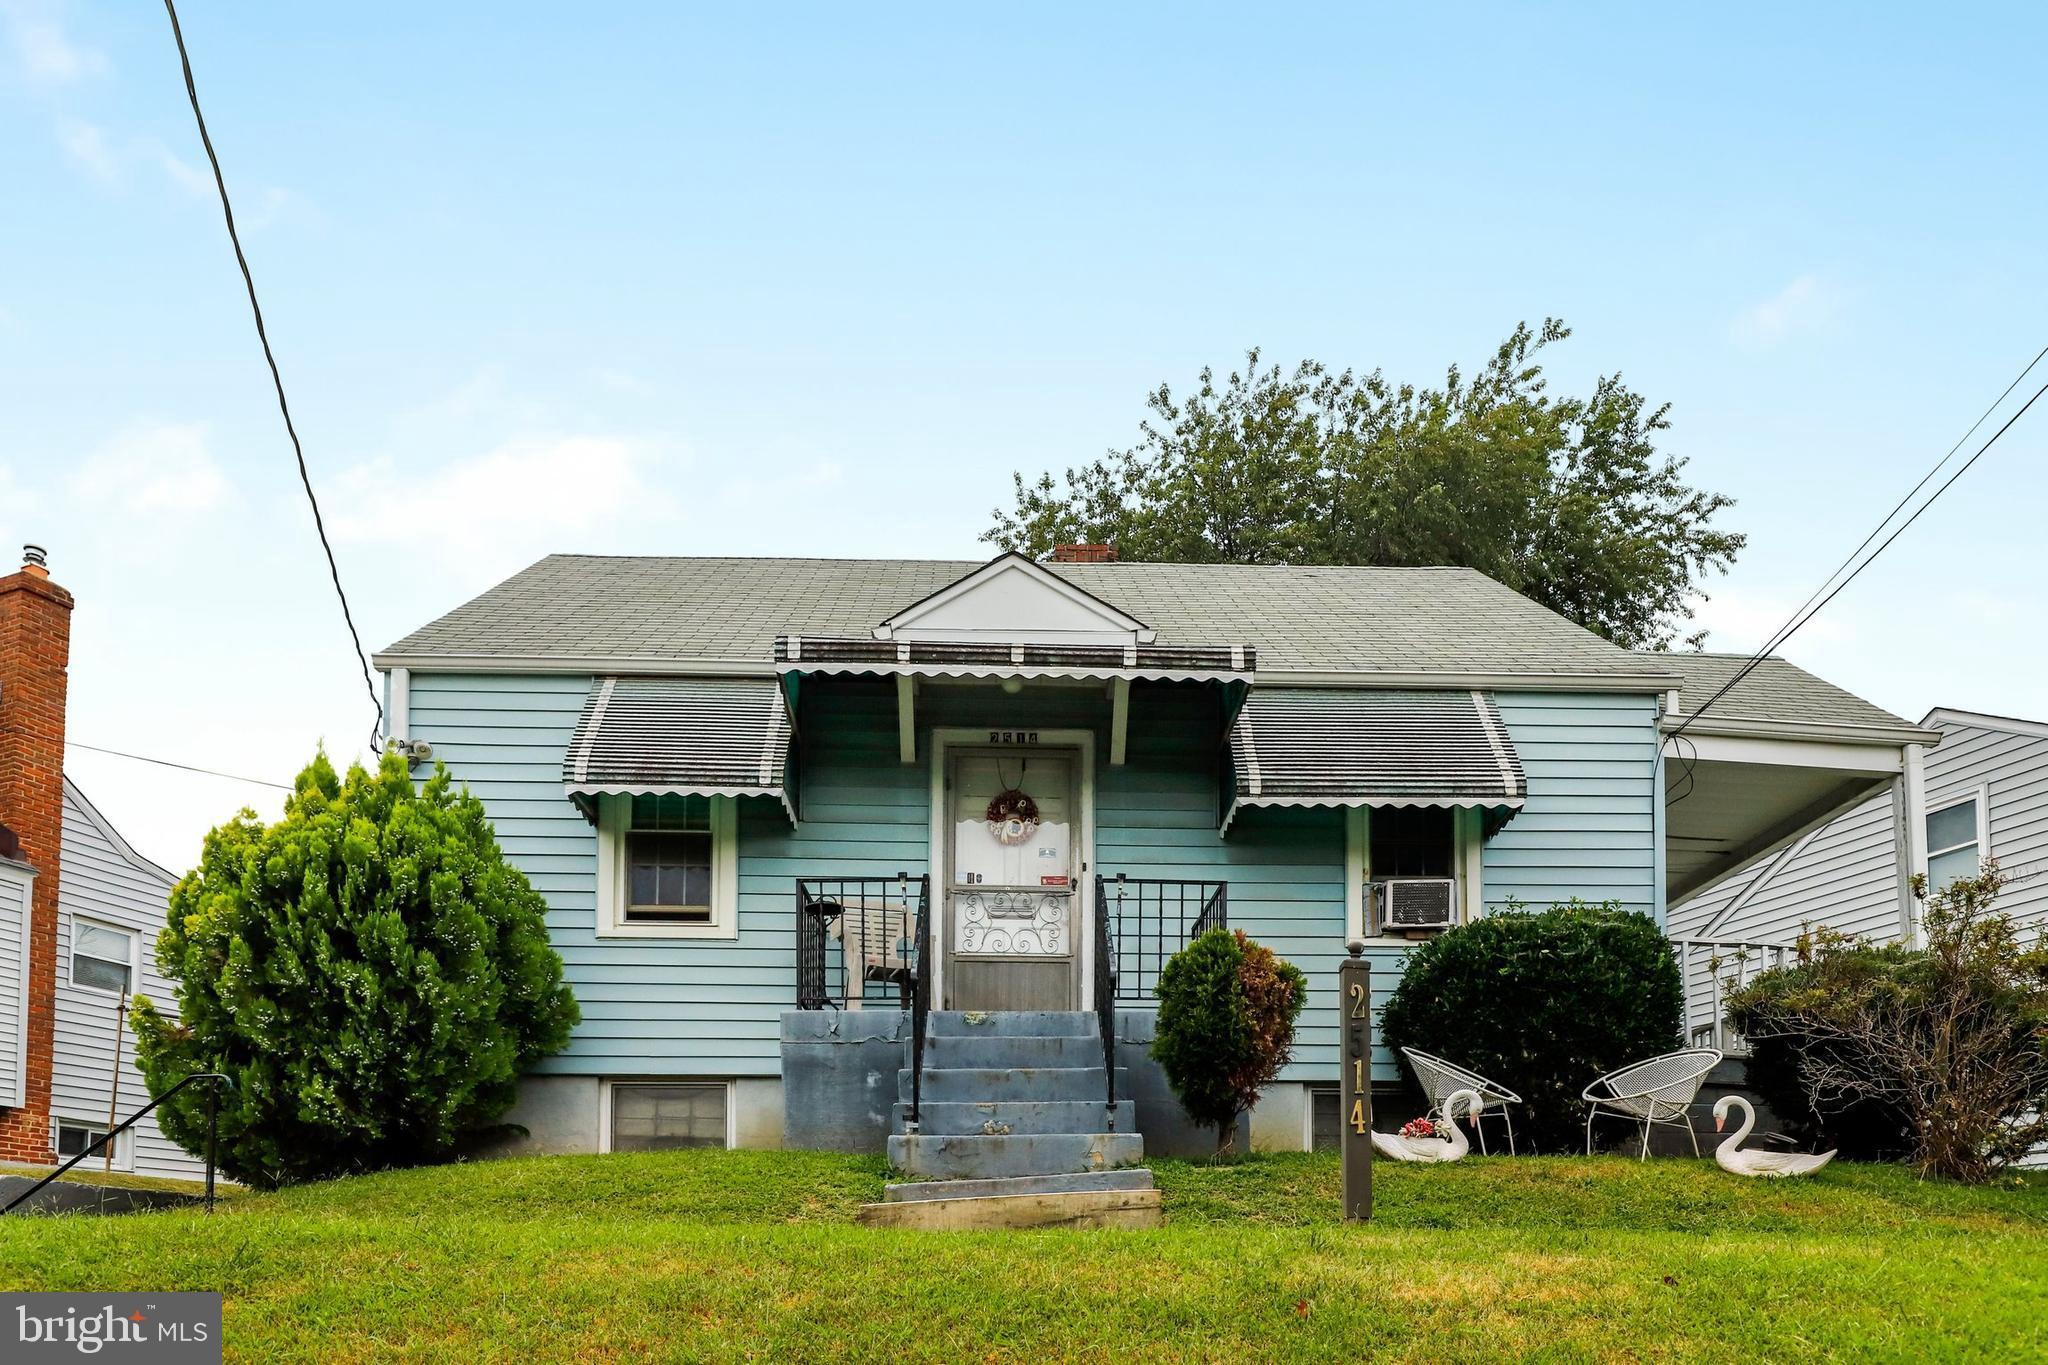 2514 S KENWOOD STREET, ARLINGTON, VA 22206